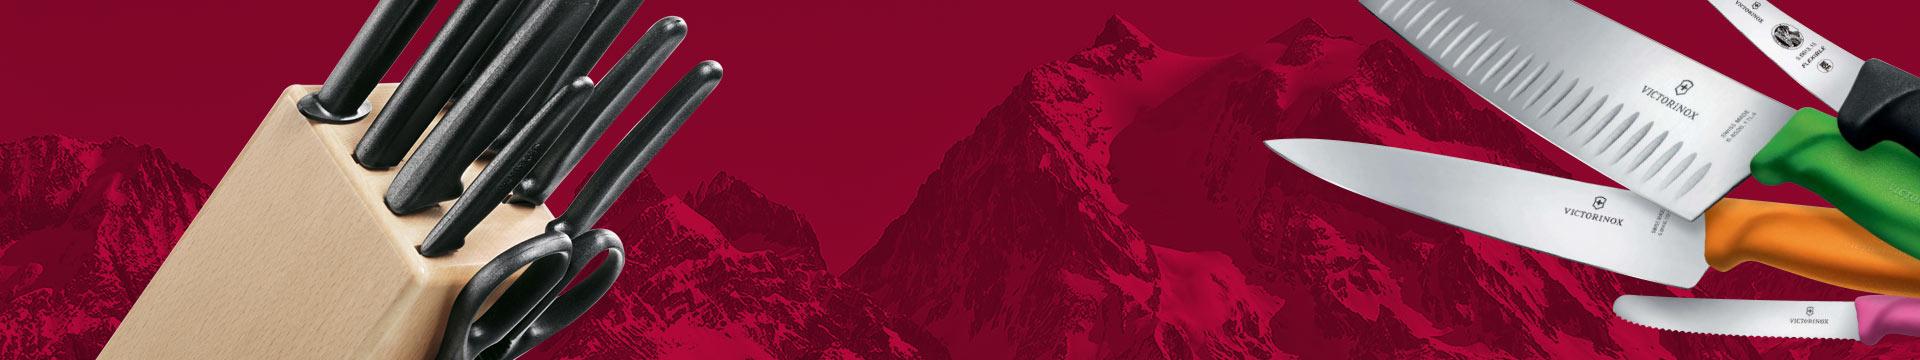 Banner image of Victorinox